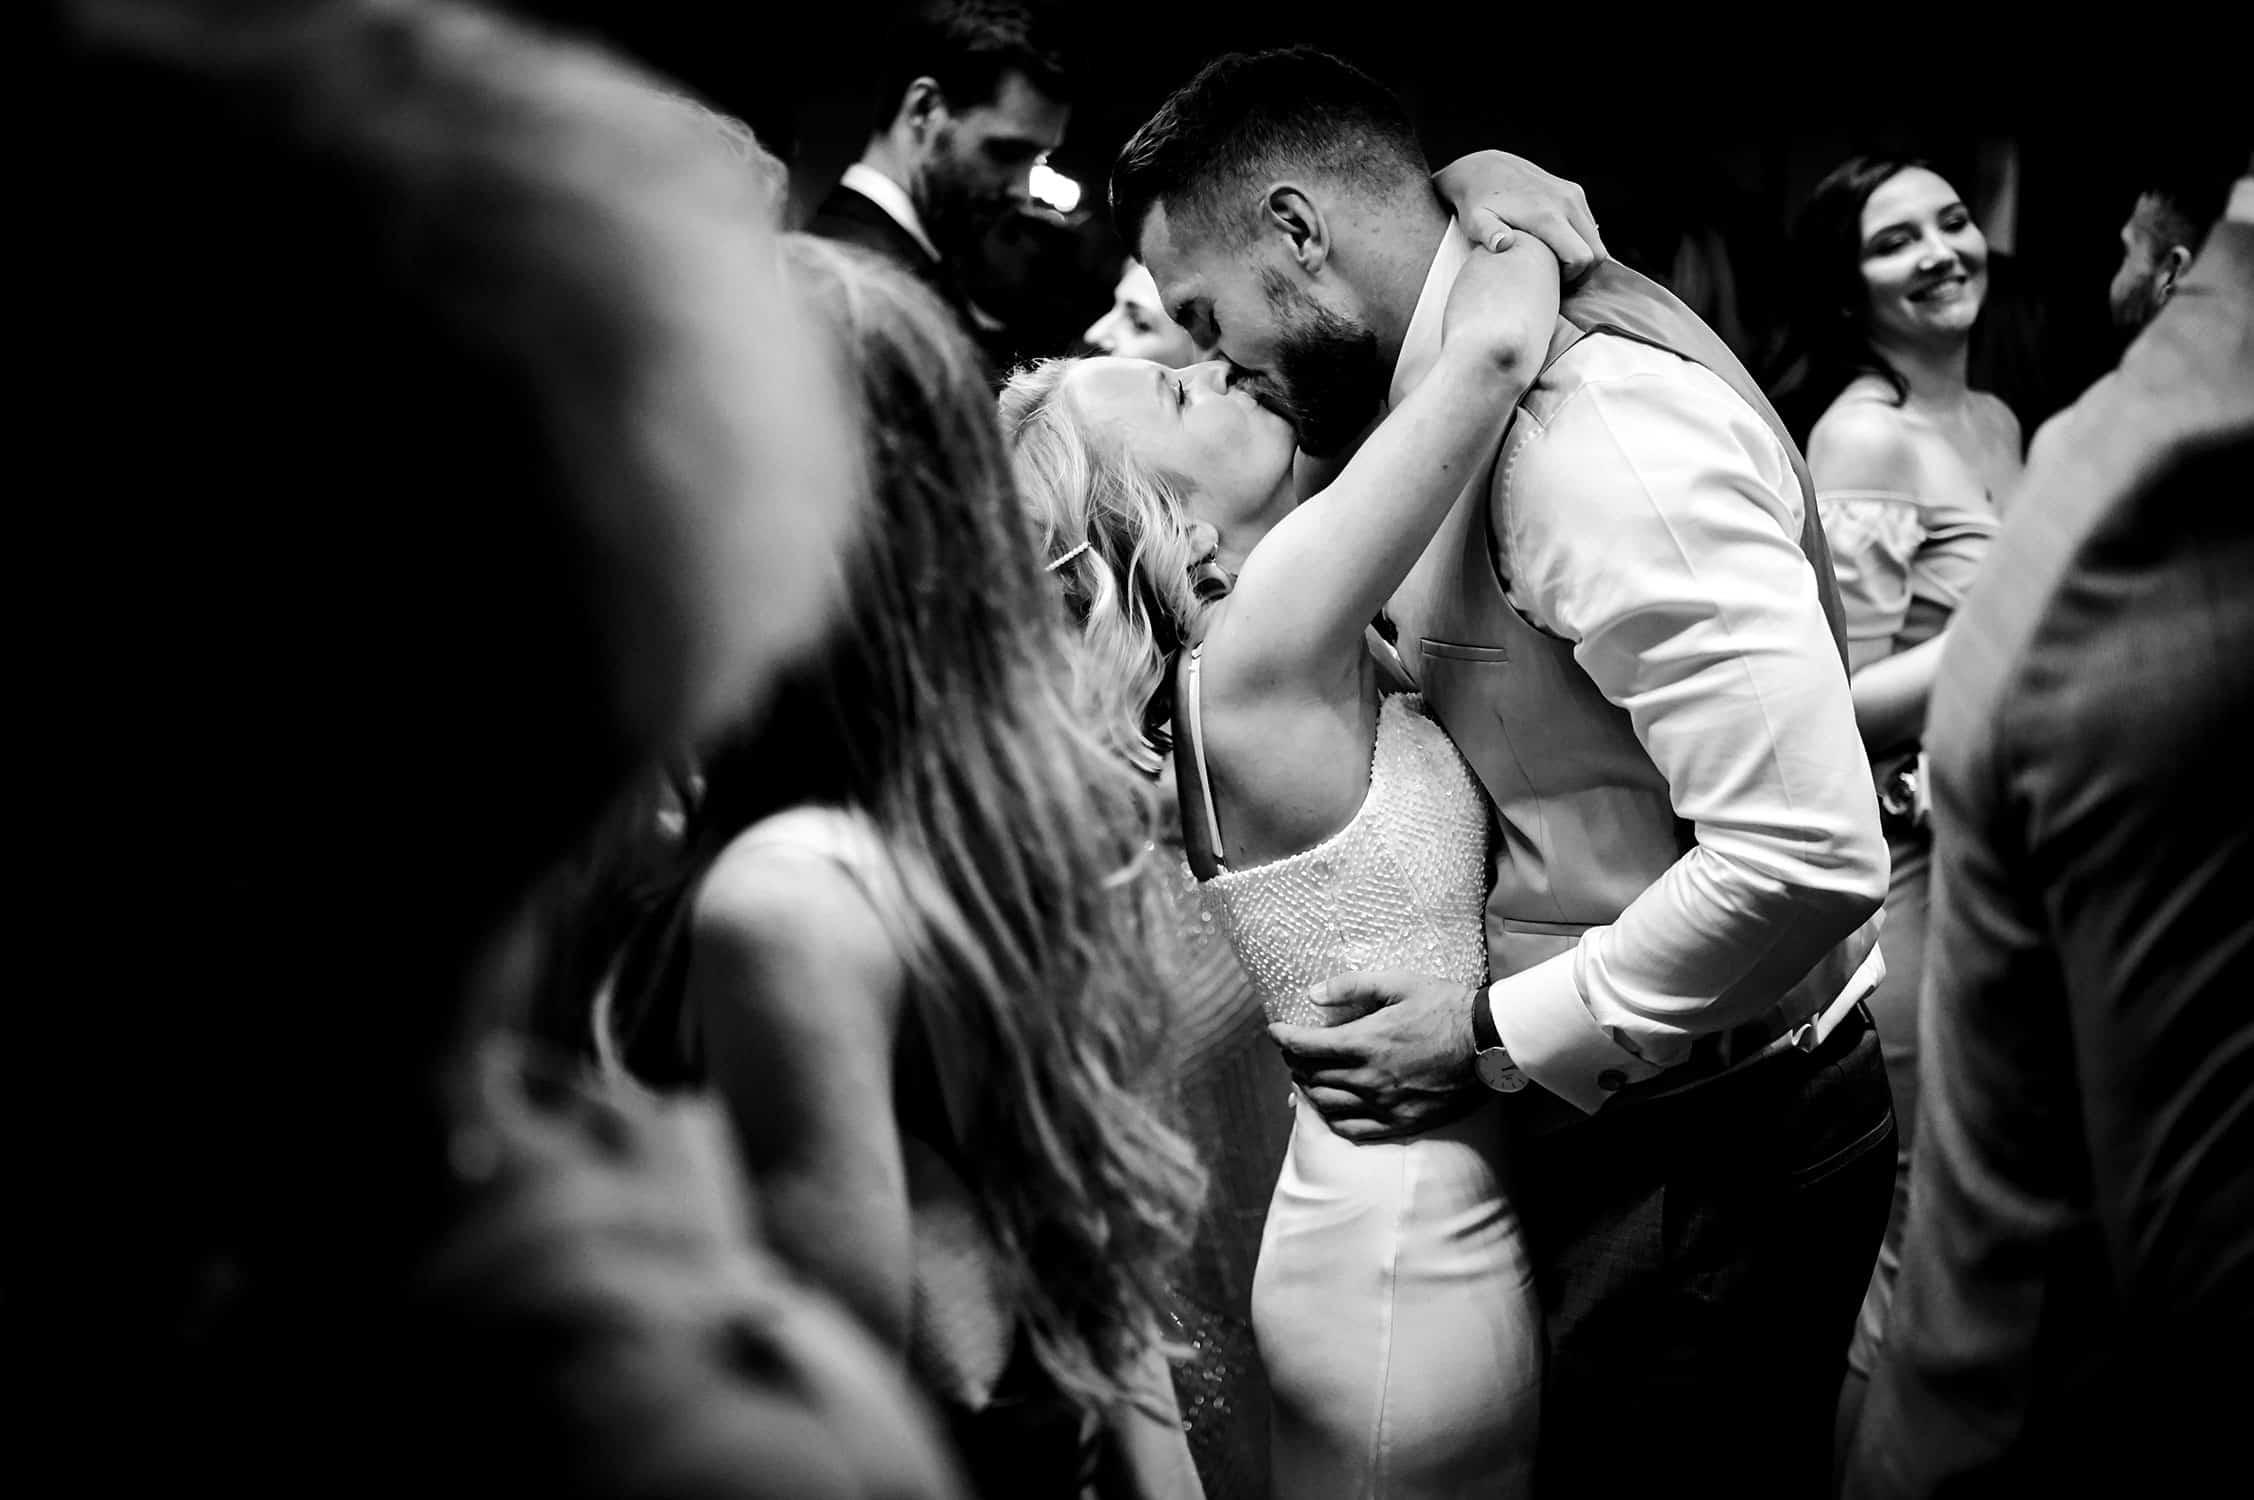 Boathouse 4 dance floor kiss